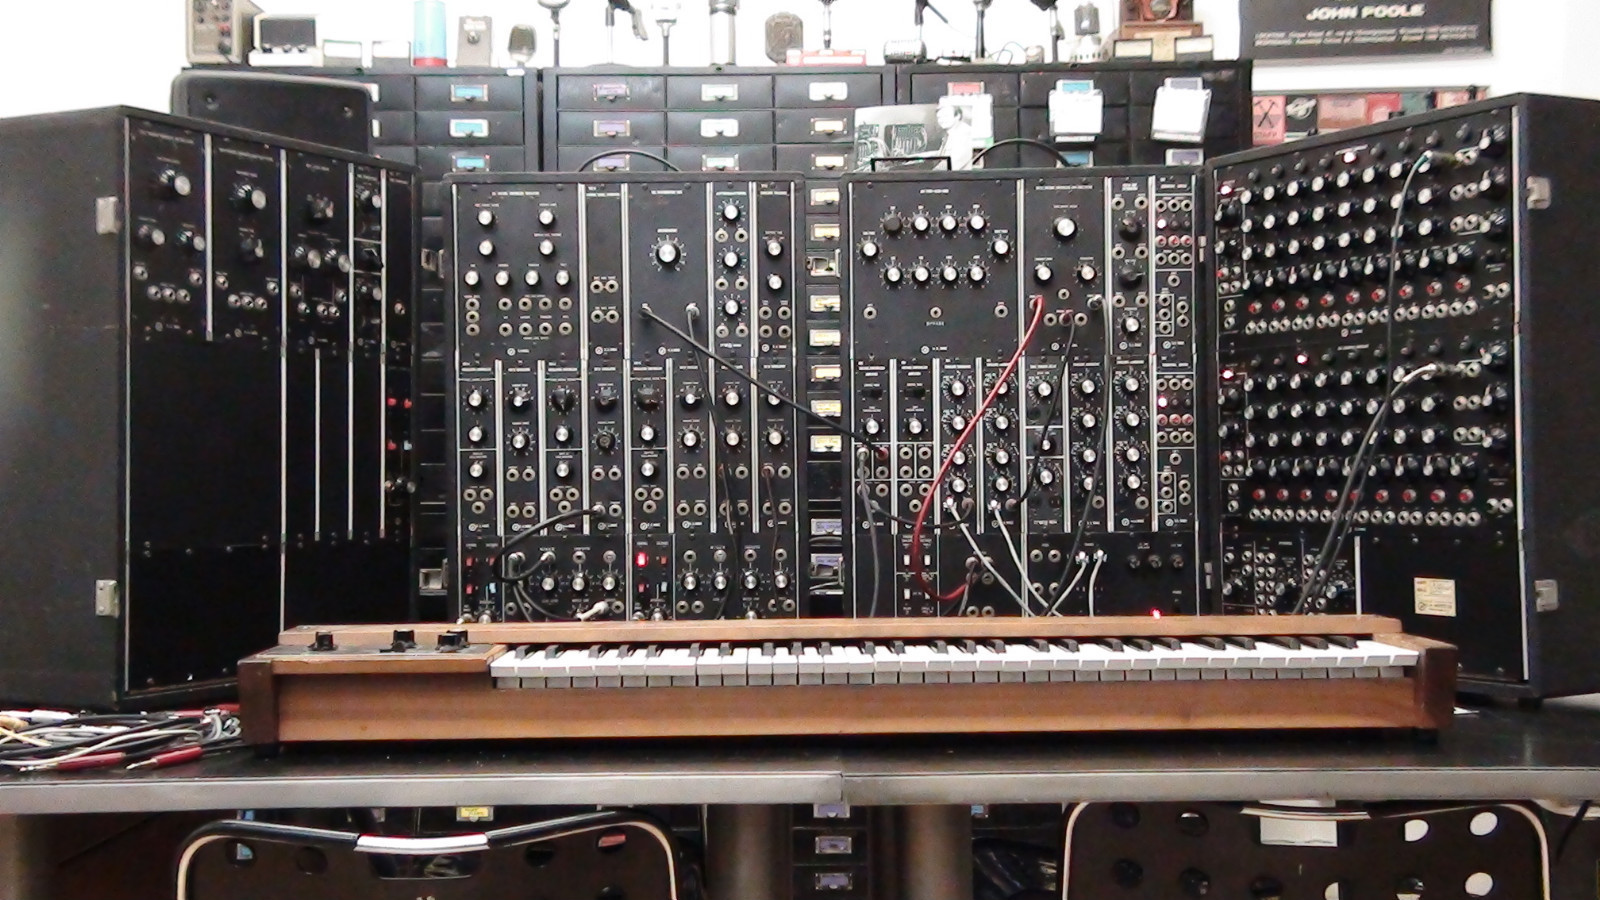 moog modular hd extraordinary - photo #5